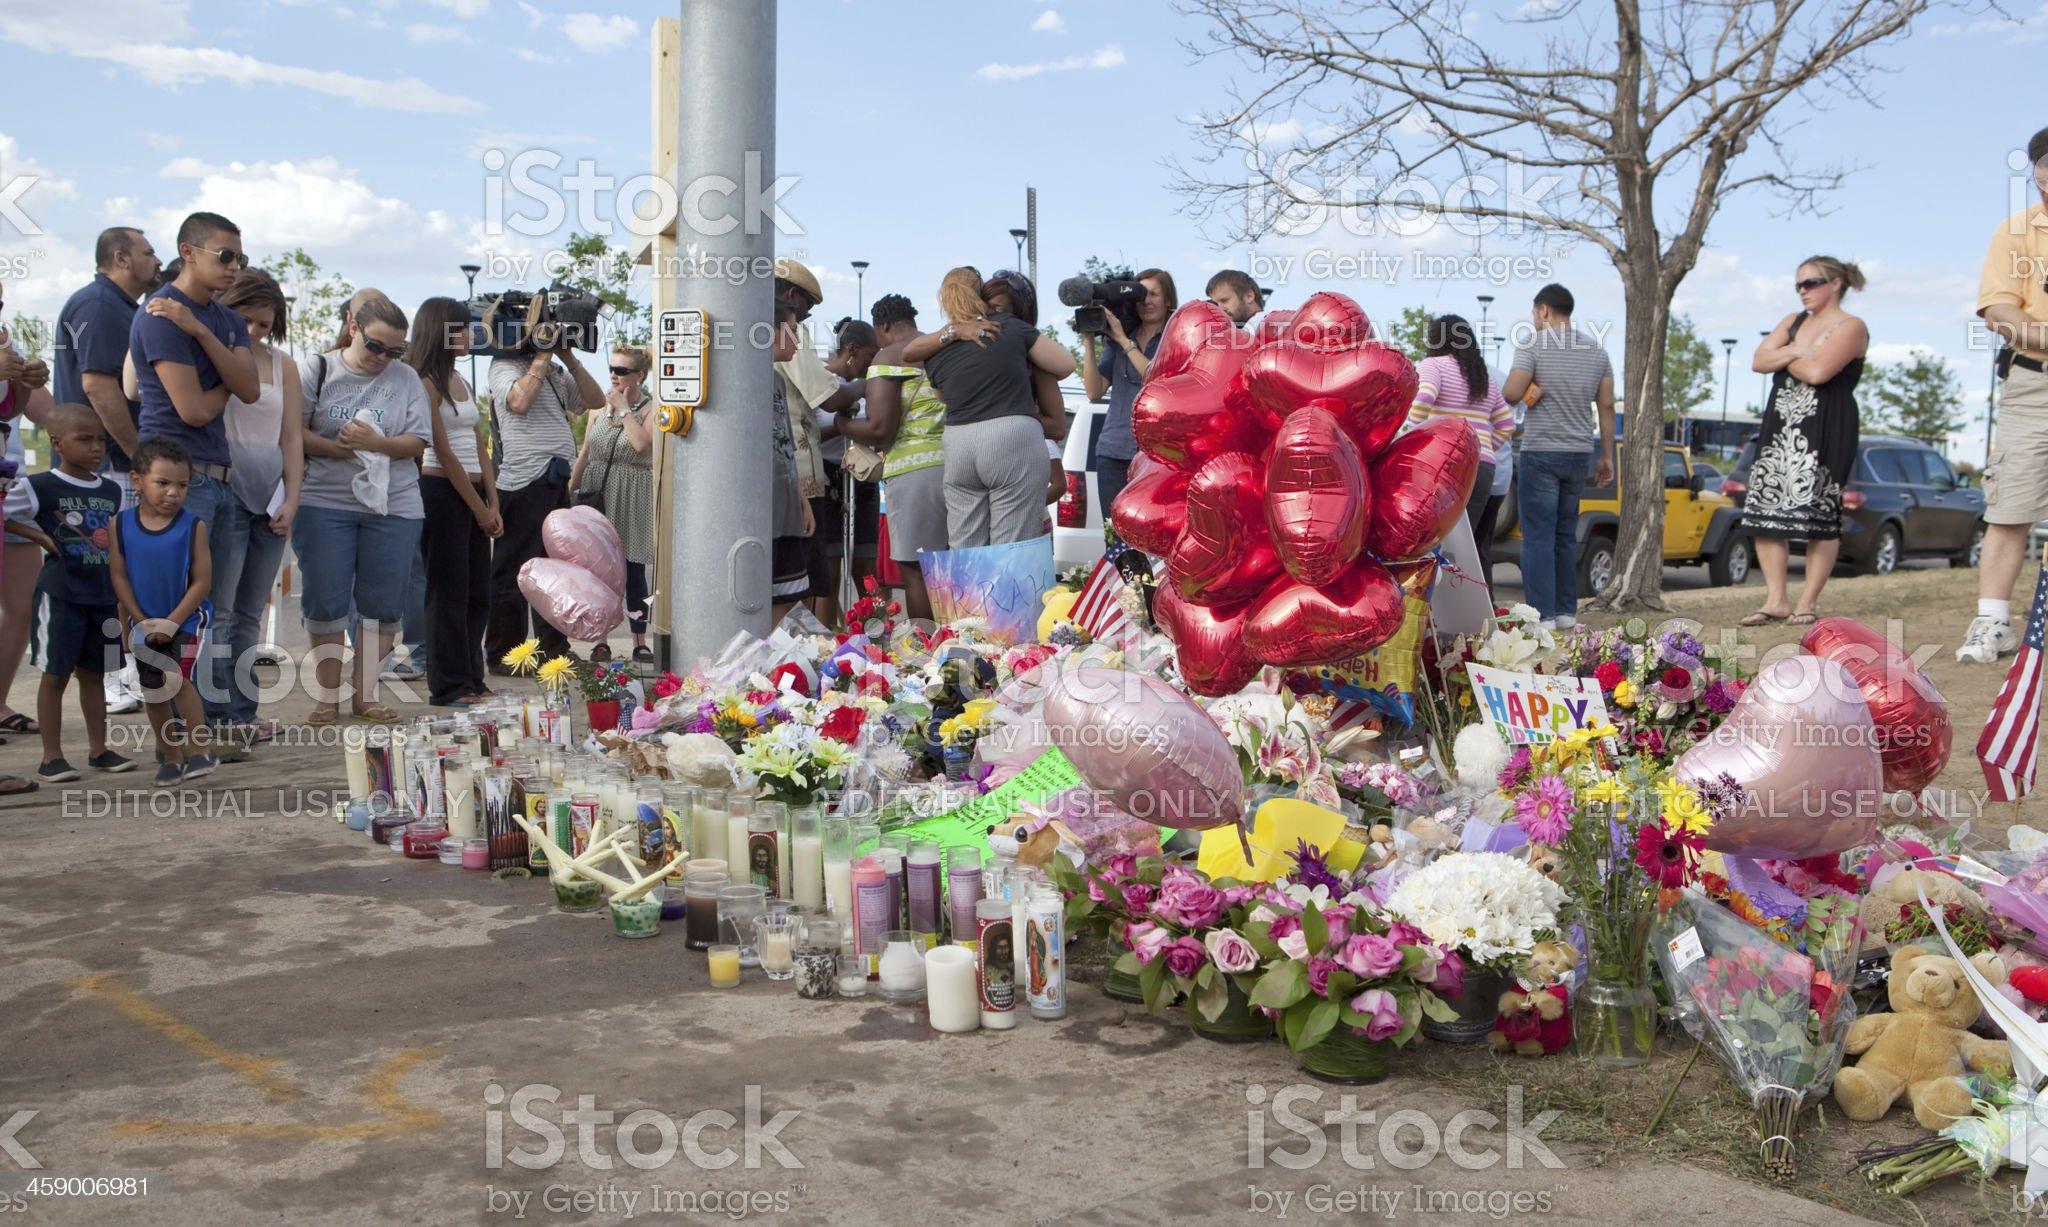 Century 16 Improvised Victim Memorial royalty-free stock photo